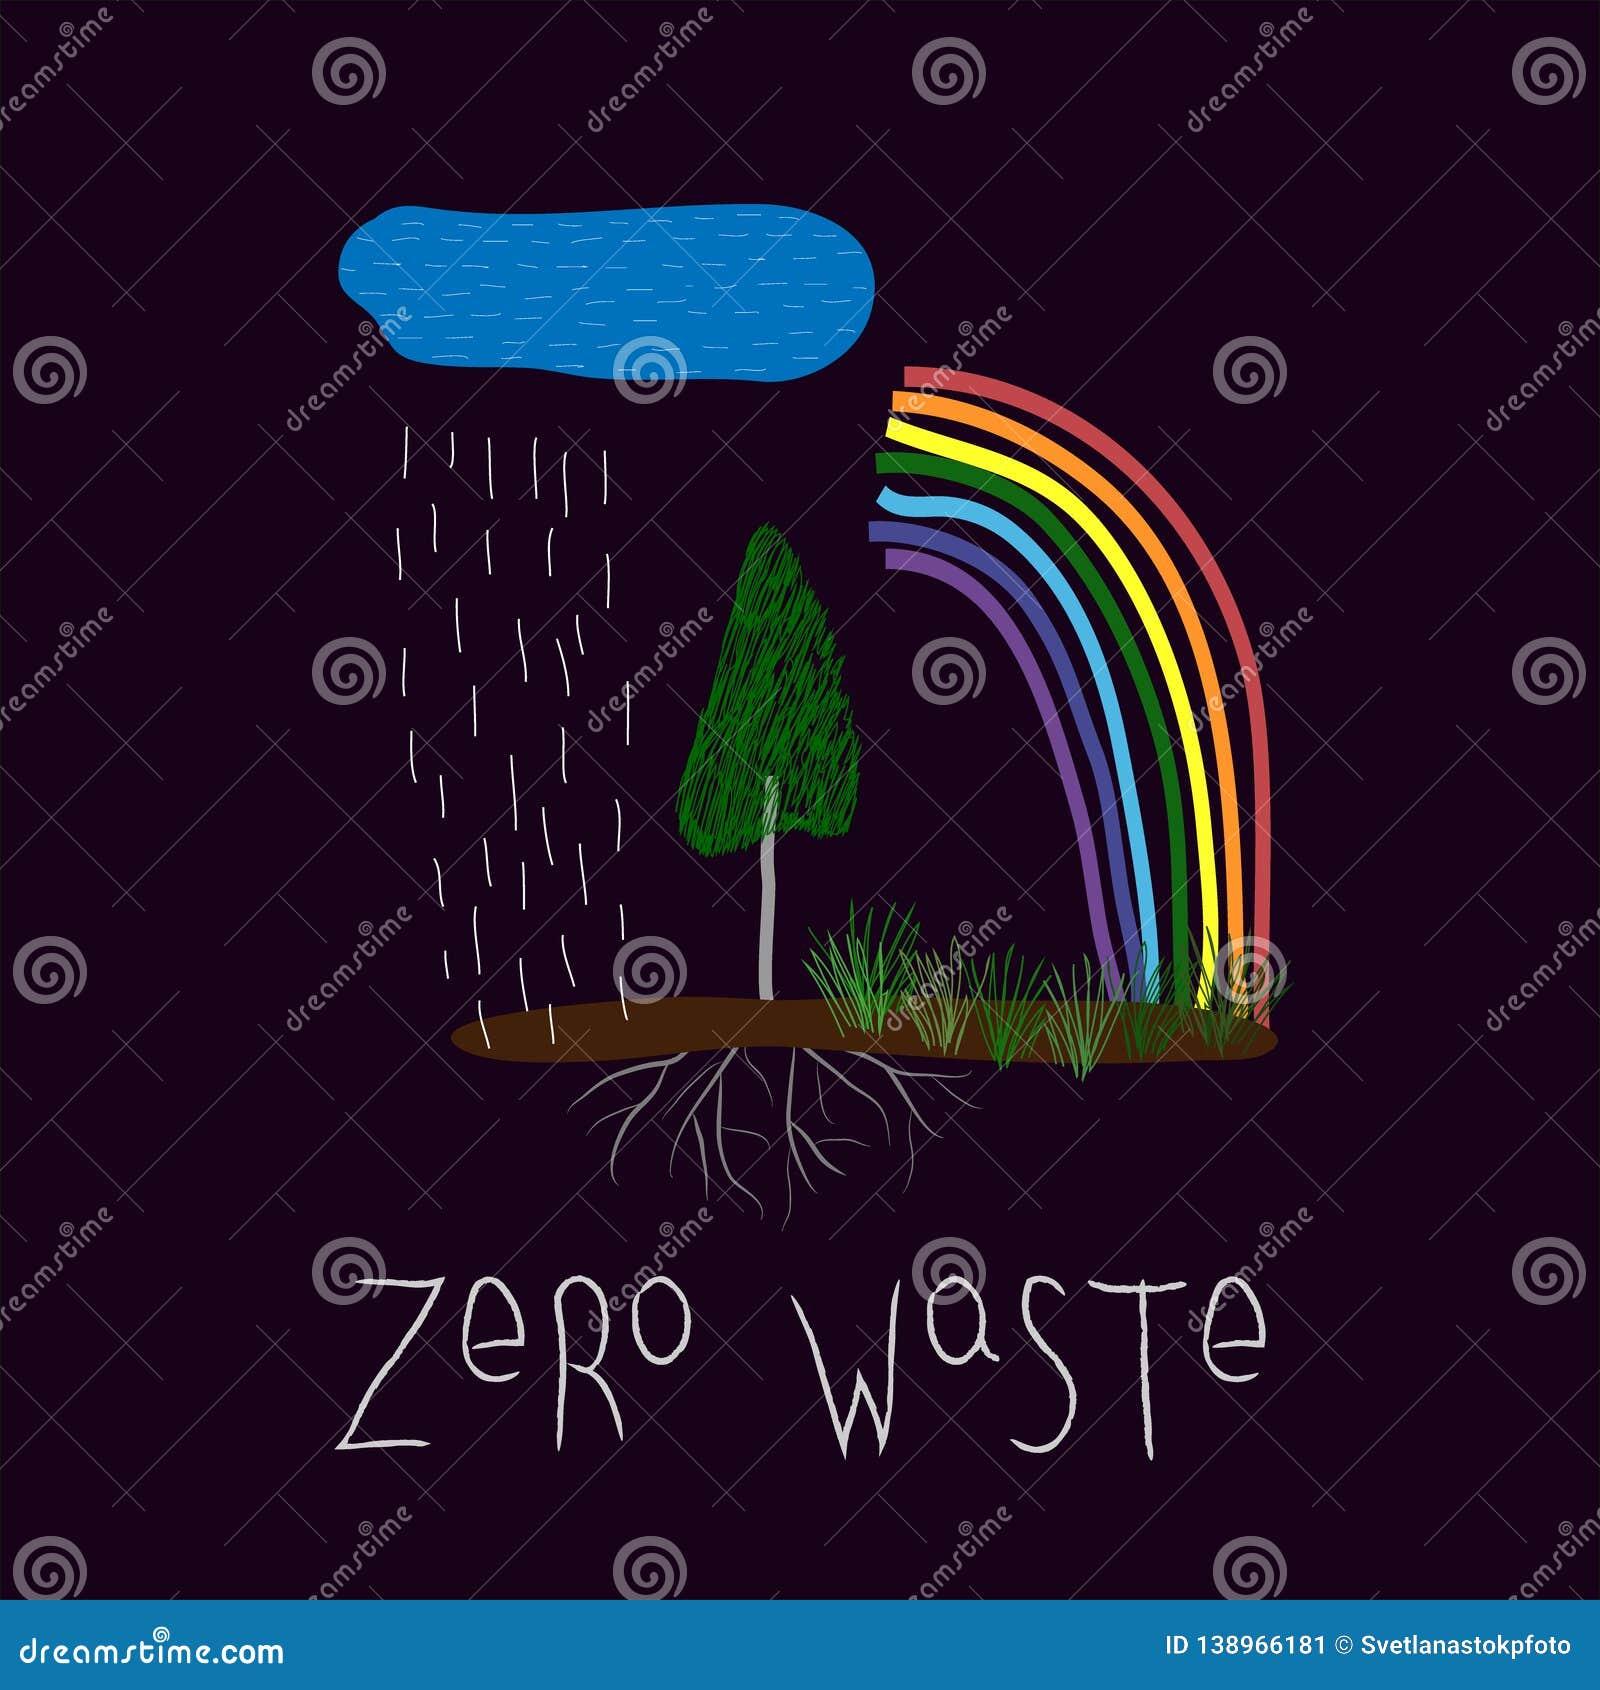 Zero waste Graphic design typography element. Hand written postcard. Cute simple vector paper cutout collage. Zero waste. Eco